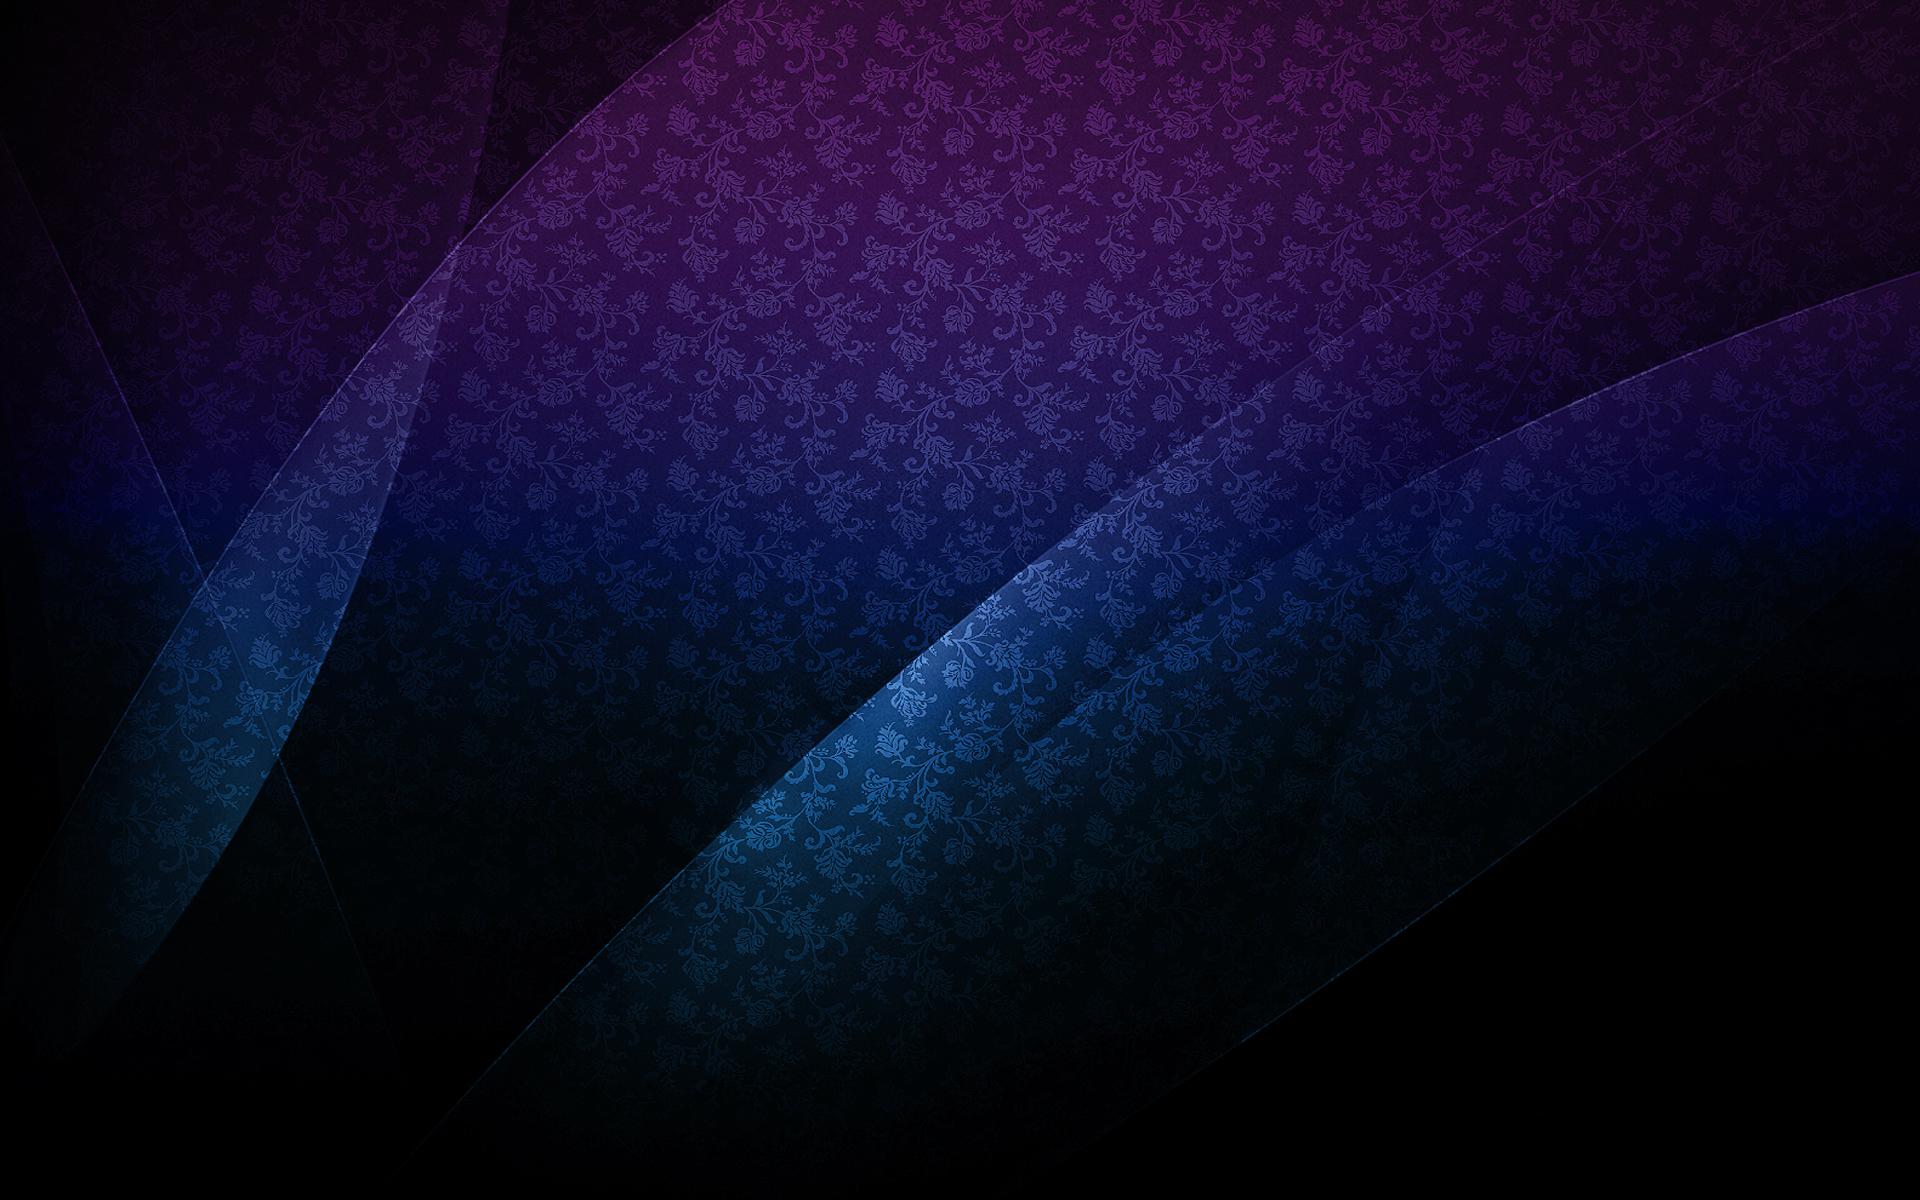 Purple To Blue Texture Google Backgrounds Purple To Blue Texture 1920x1200